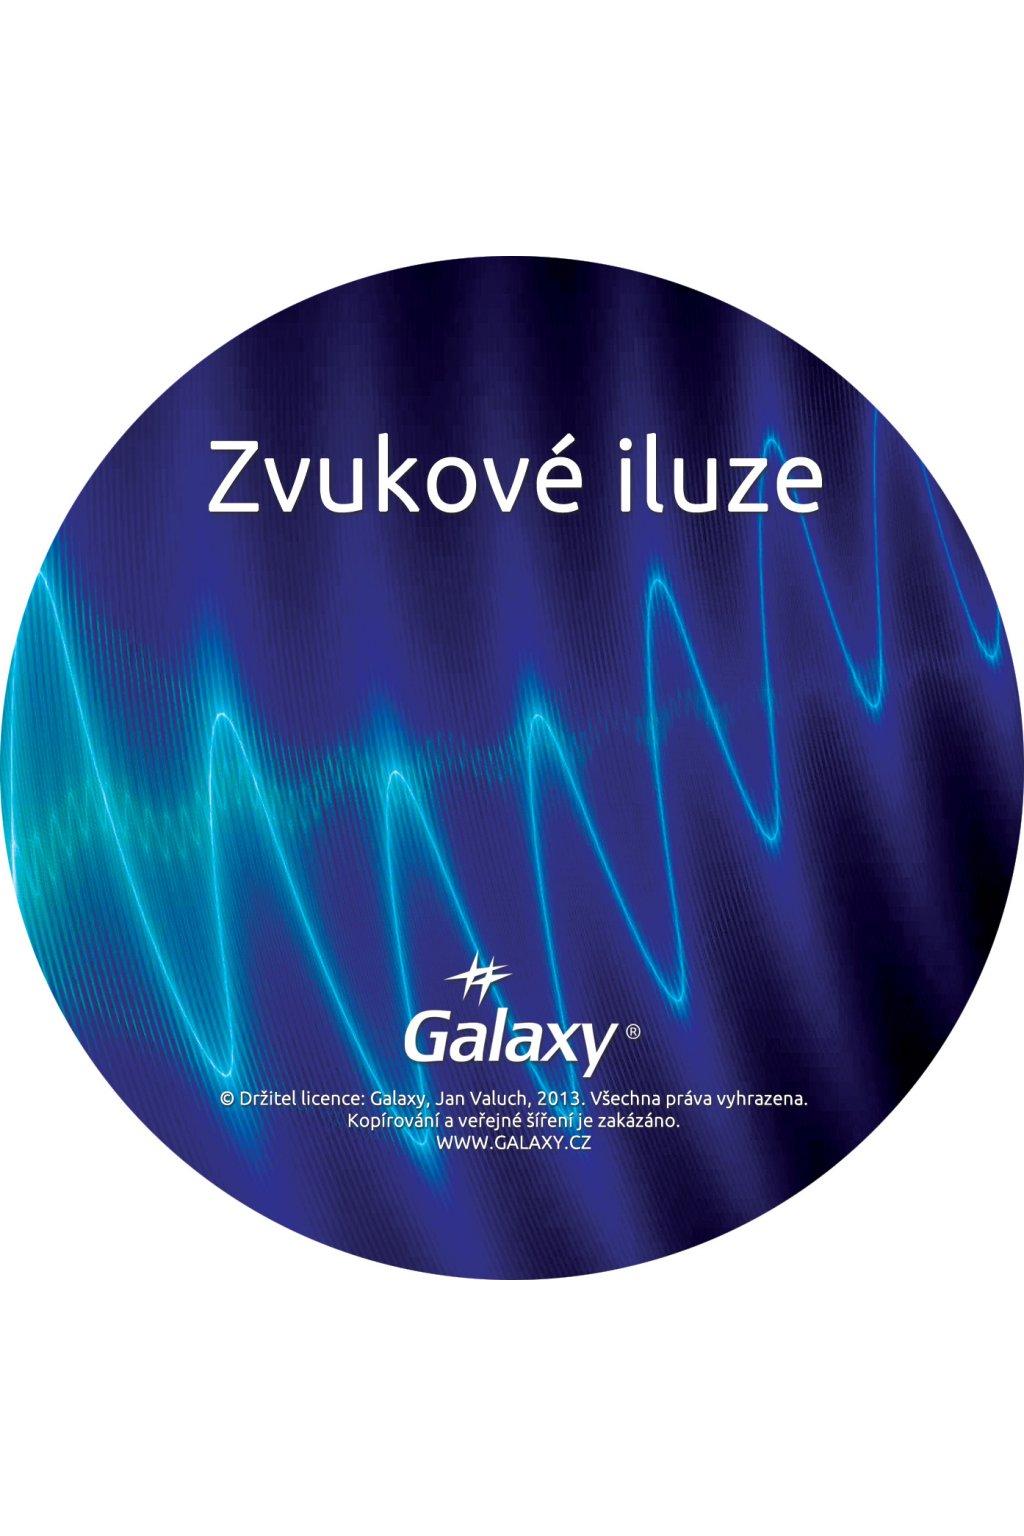 zvukove iluze disk